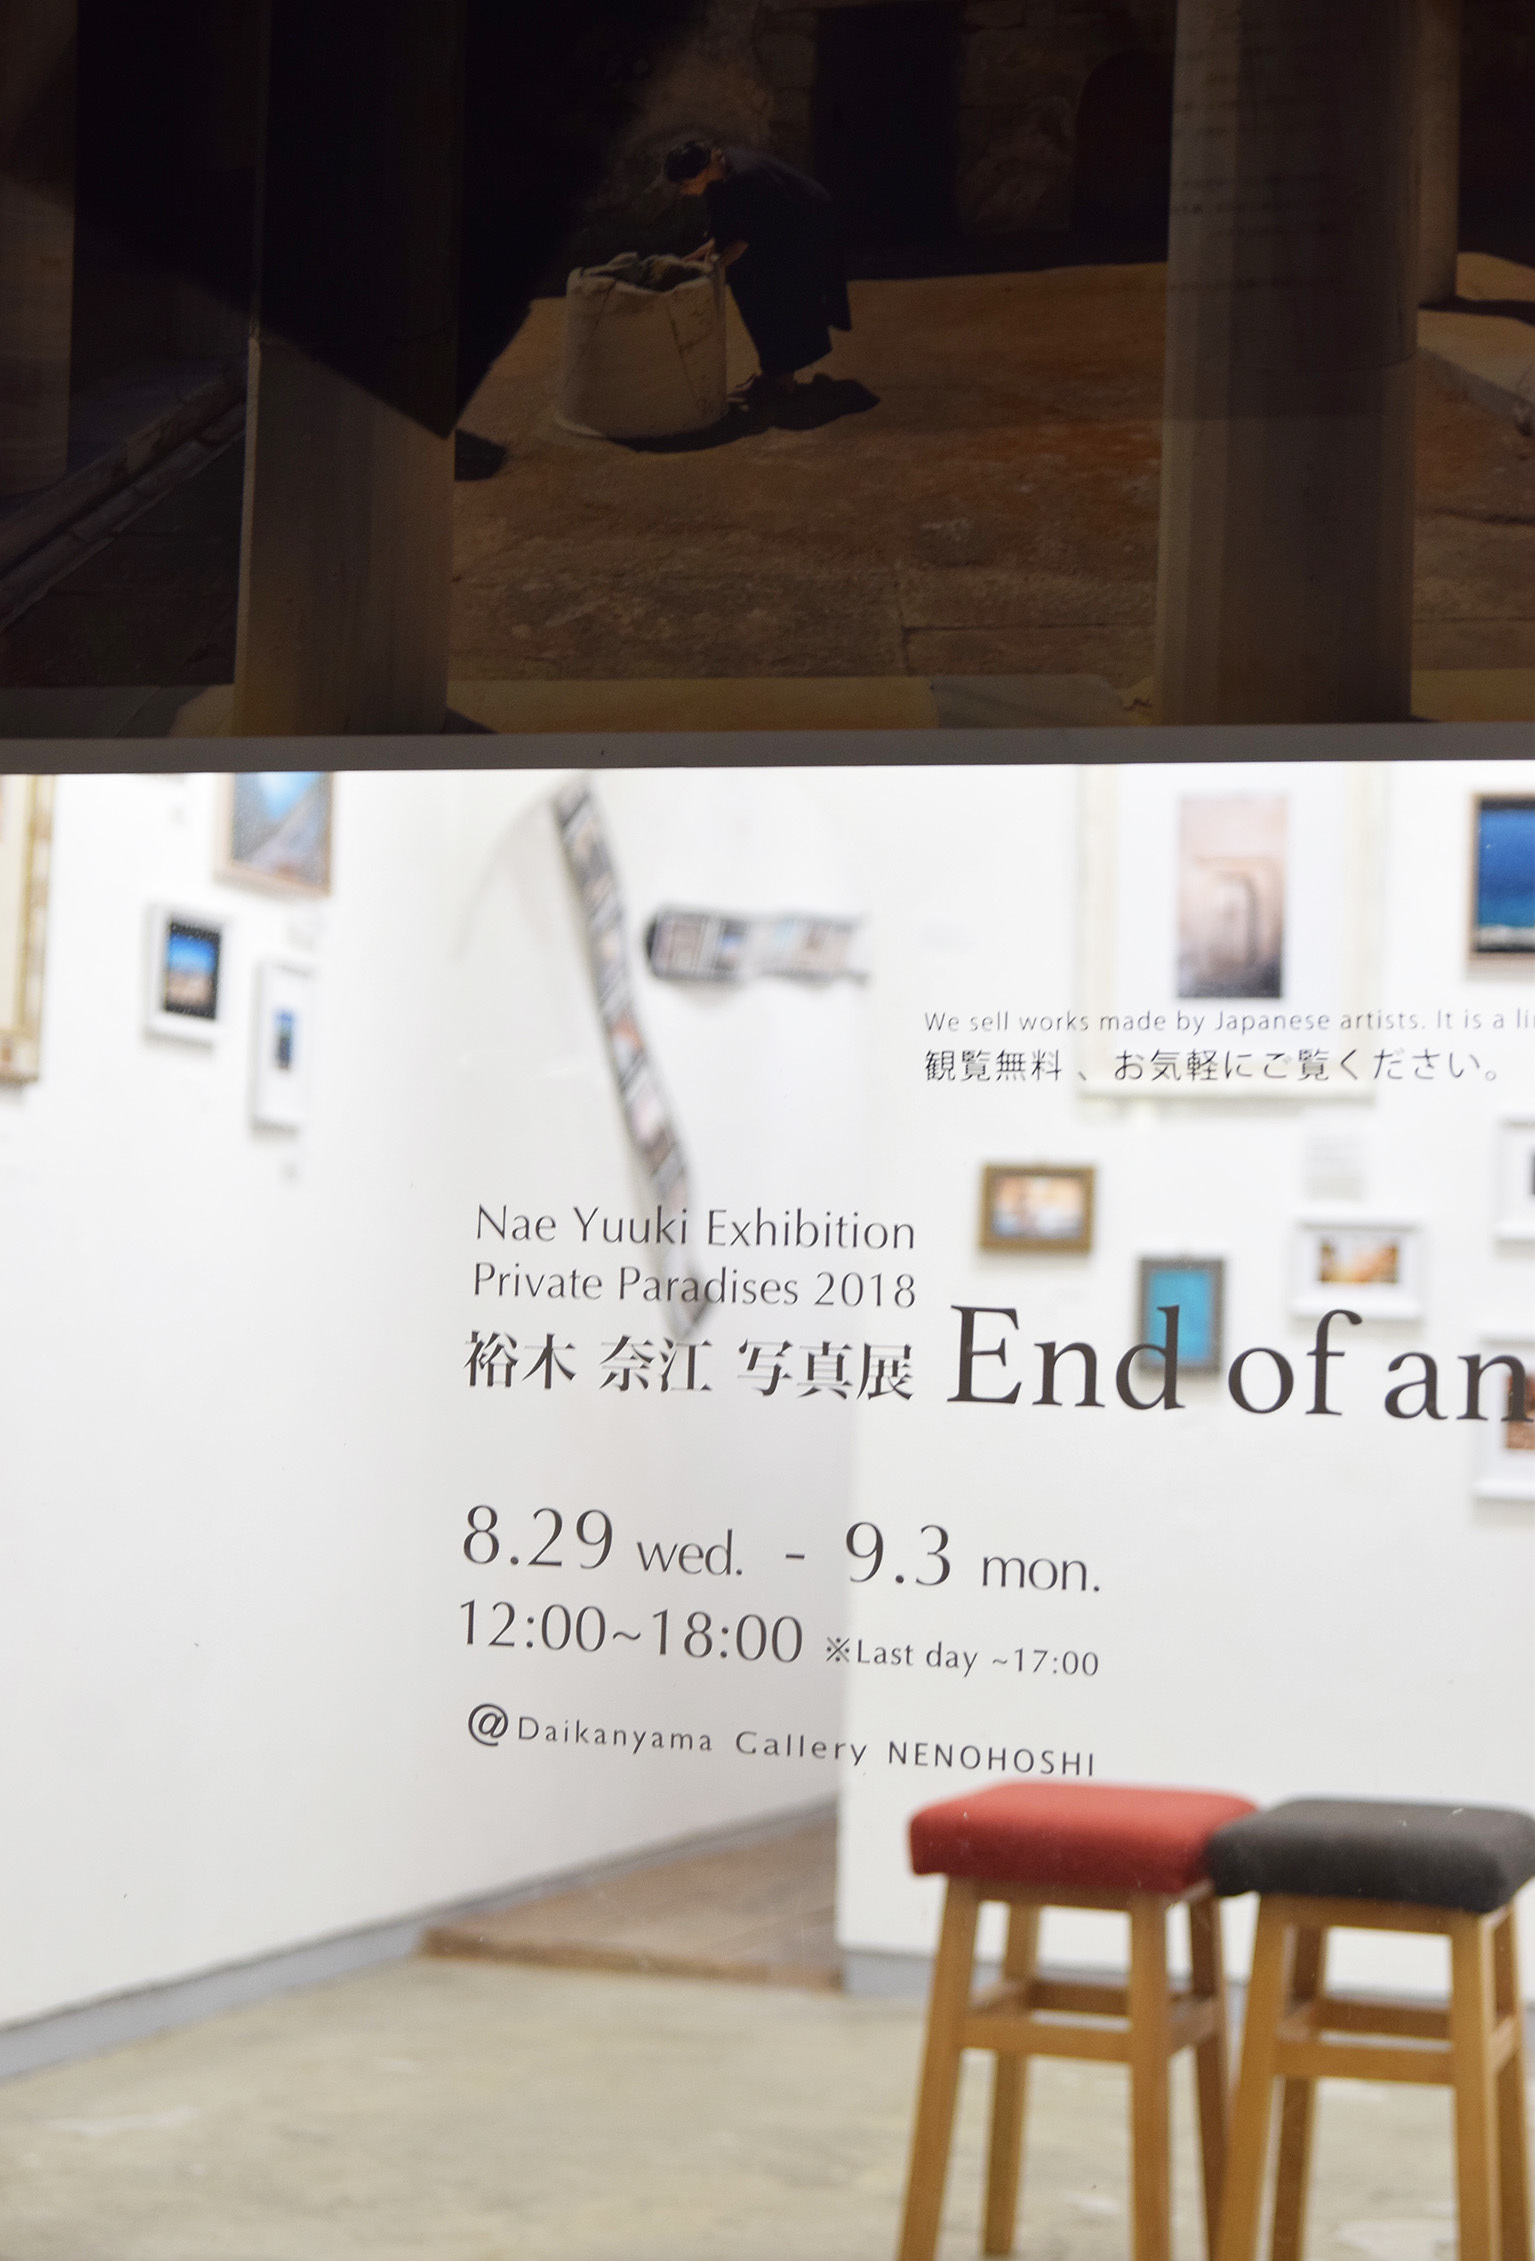 裕木奈江写真展  Nae Yuuki Exhibition Private Paradises End of an era 2018.8.29(水)~9.3(月) @1日目_e0272050_19532535.jpg